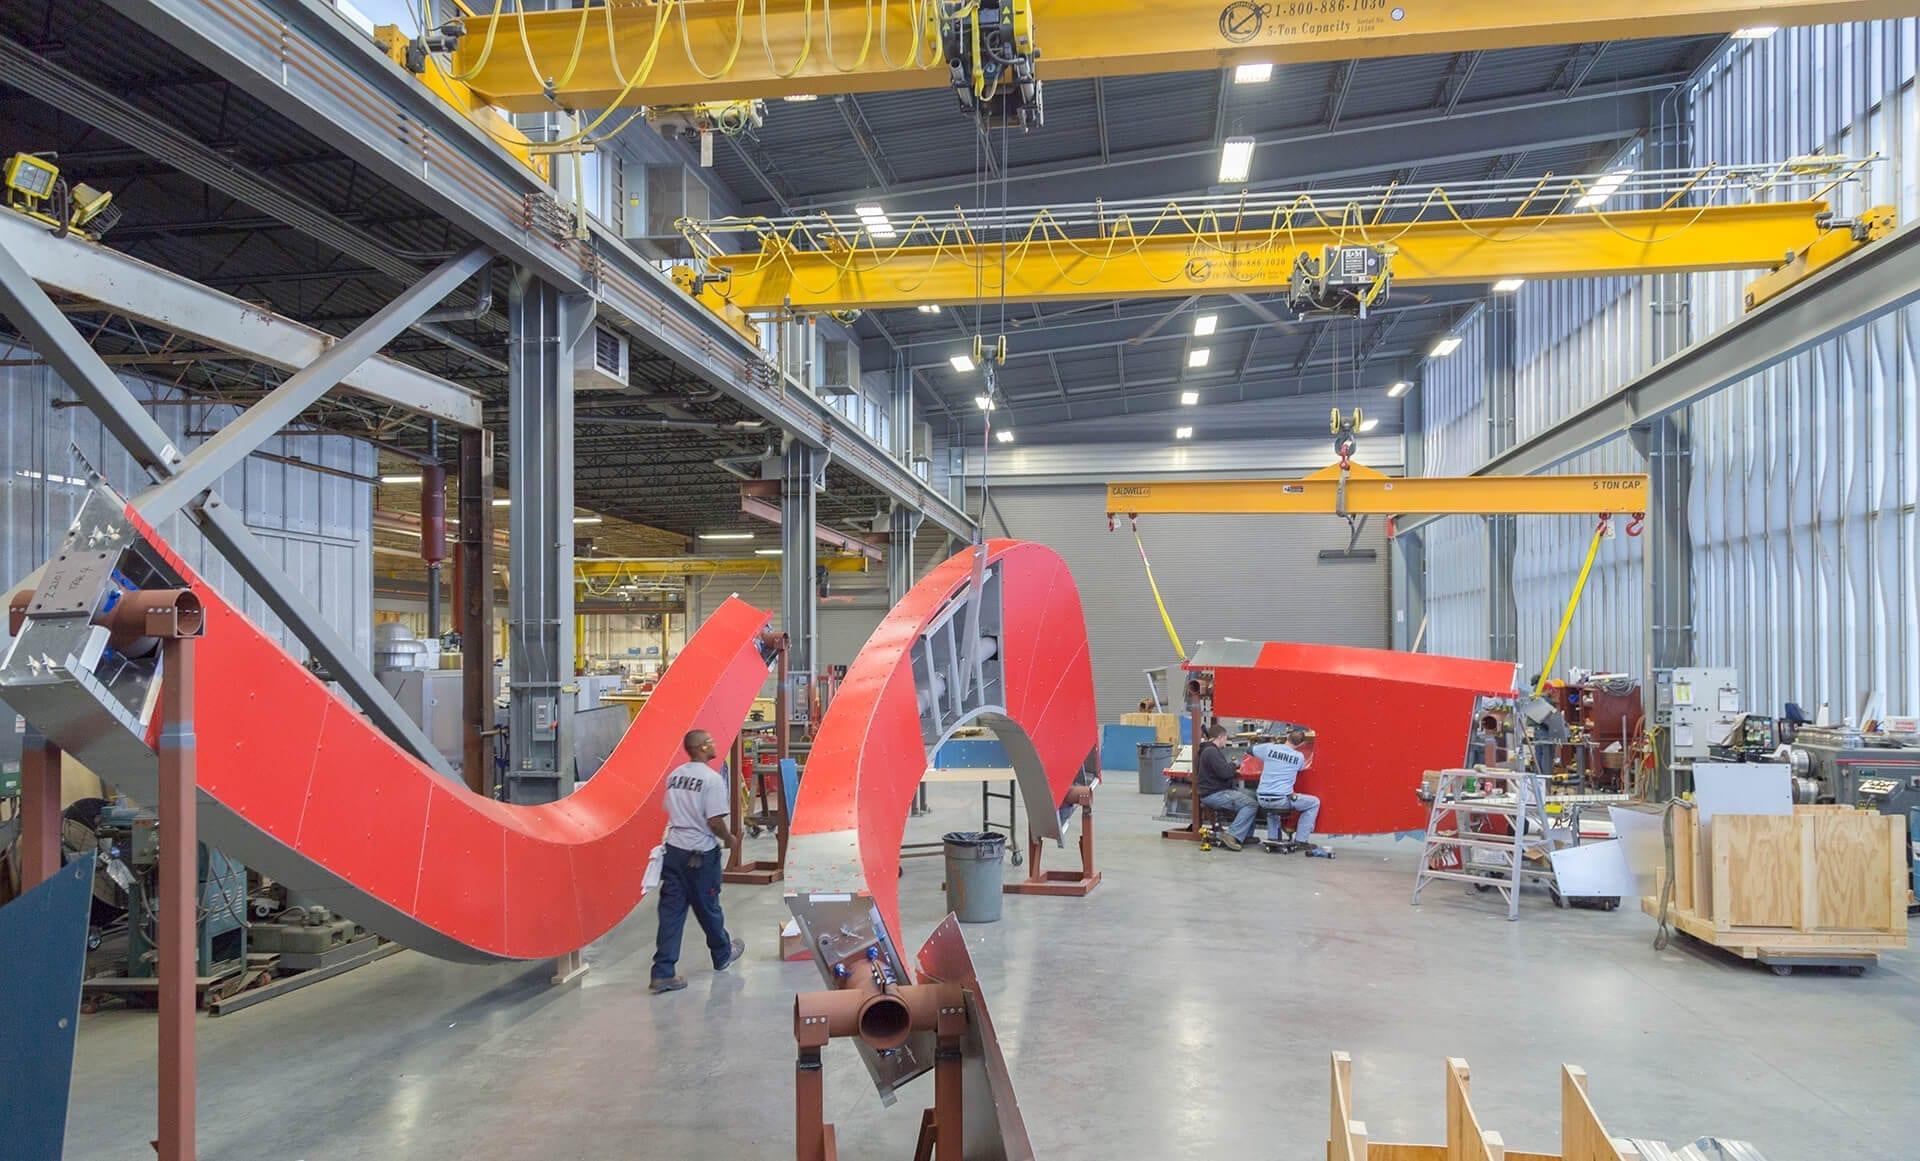 Zahner fabricators create massive ZEPPS panel assemblies in the Kansas City shop.